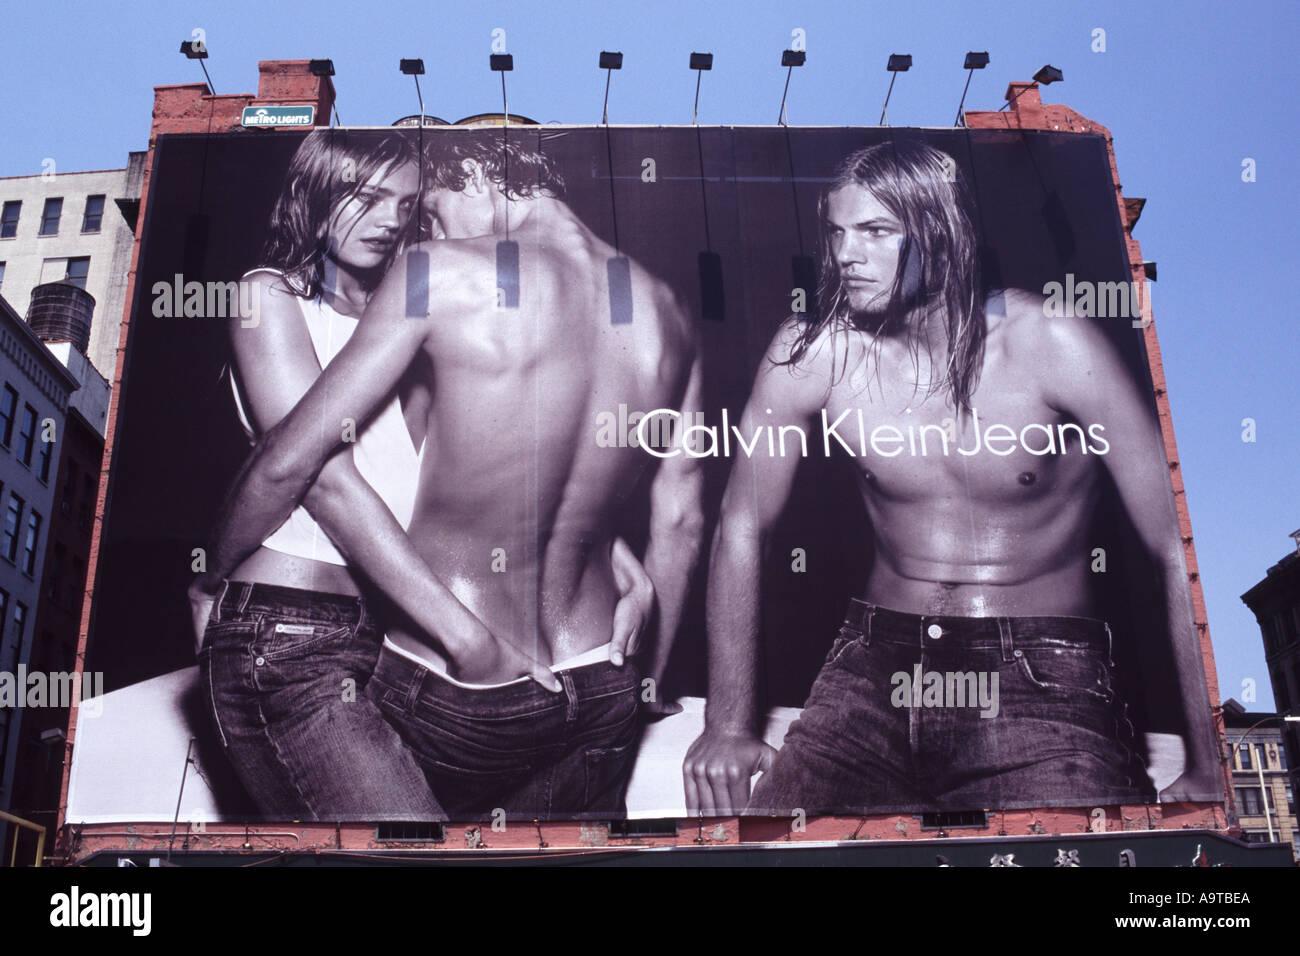 calvin klein billboard new york city stock photo 2313193 alamy